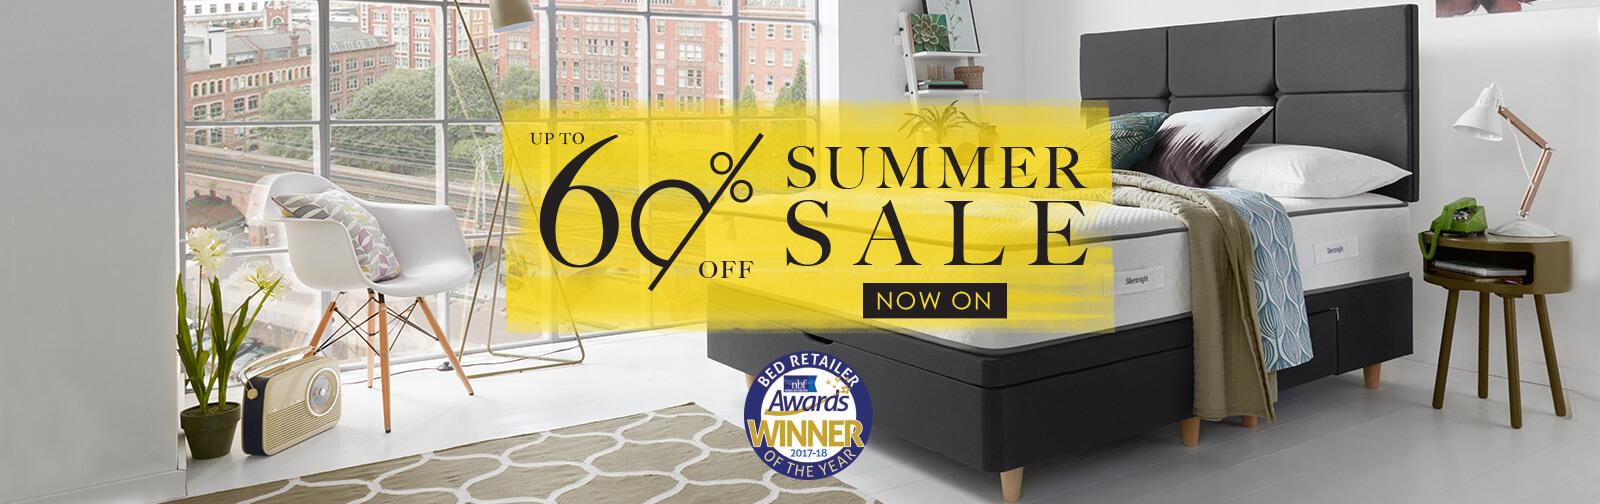 Summer Bed Sale